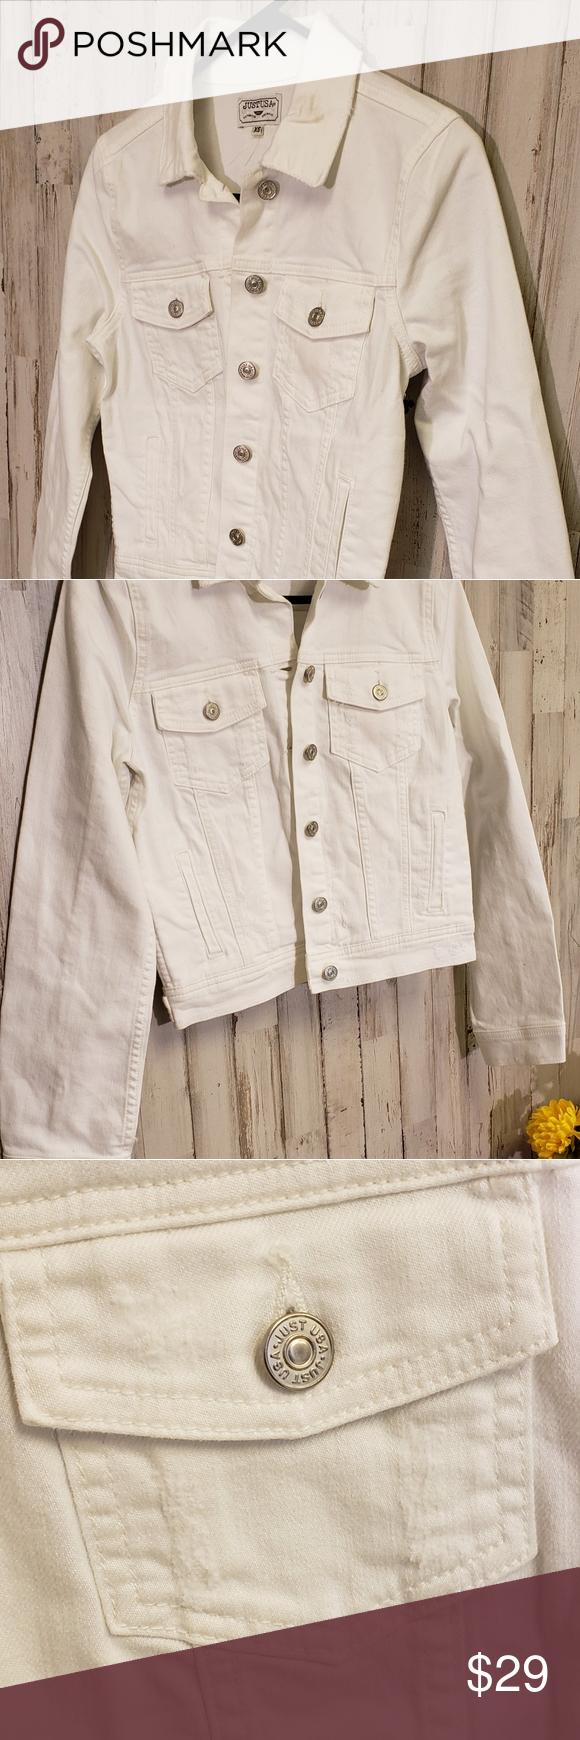 Just Usa White Distressed Denim Jacket Size Xs Distressed Denim Jacket Distressed Denim Denim Jacket [ 1740 x 580 Pixel ]